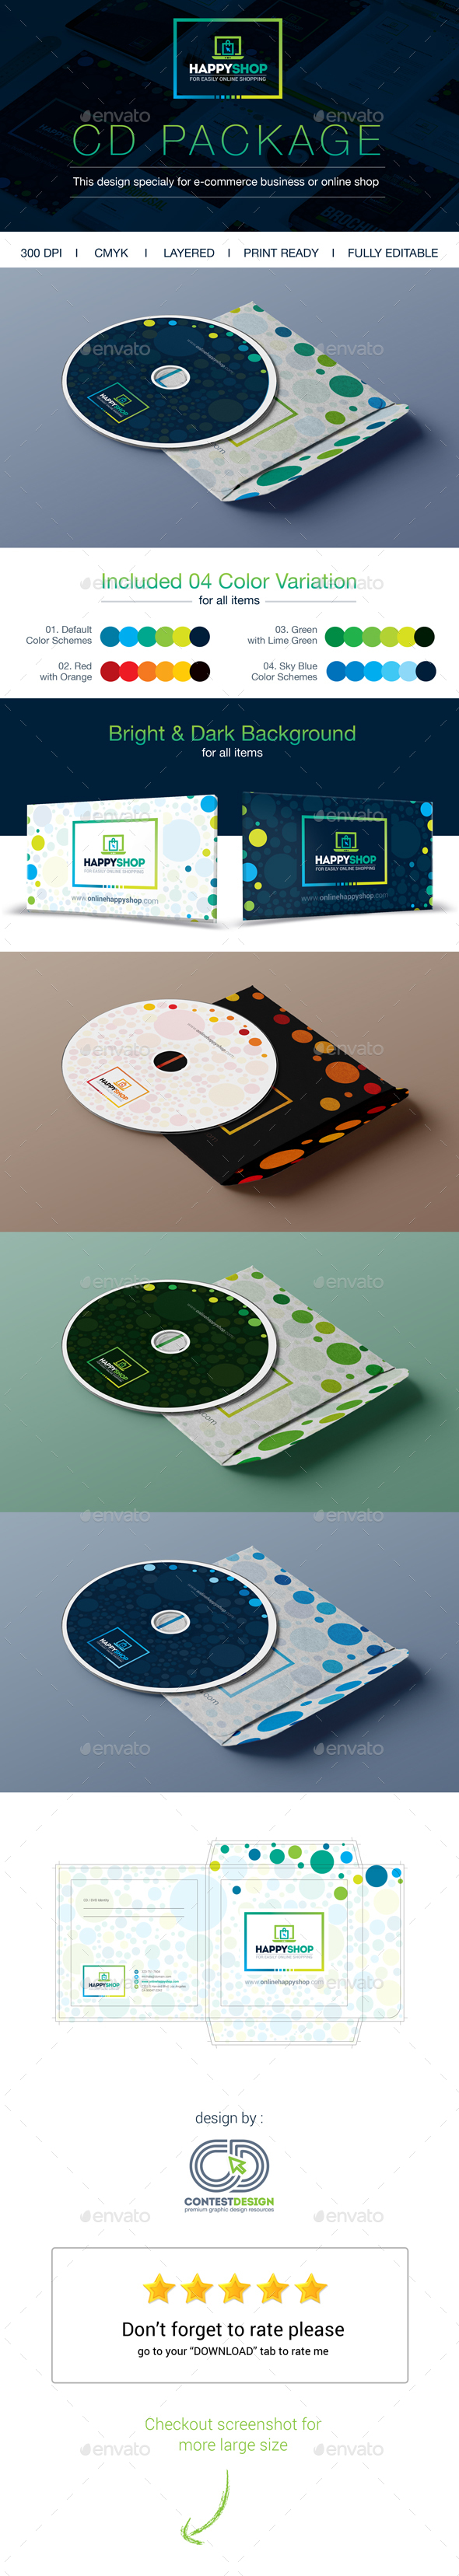 HappyShop : E-Commerce Business CD Package